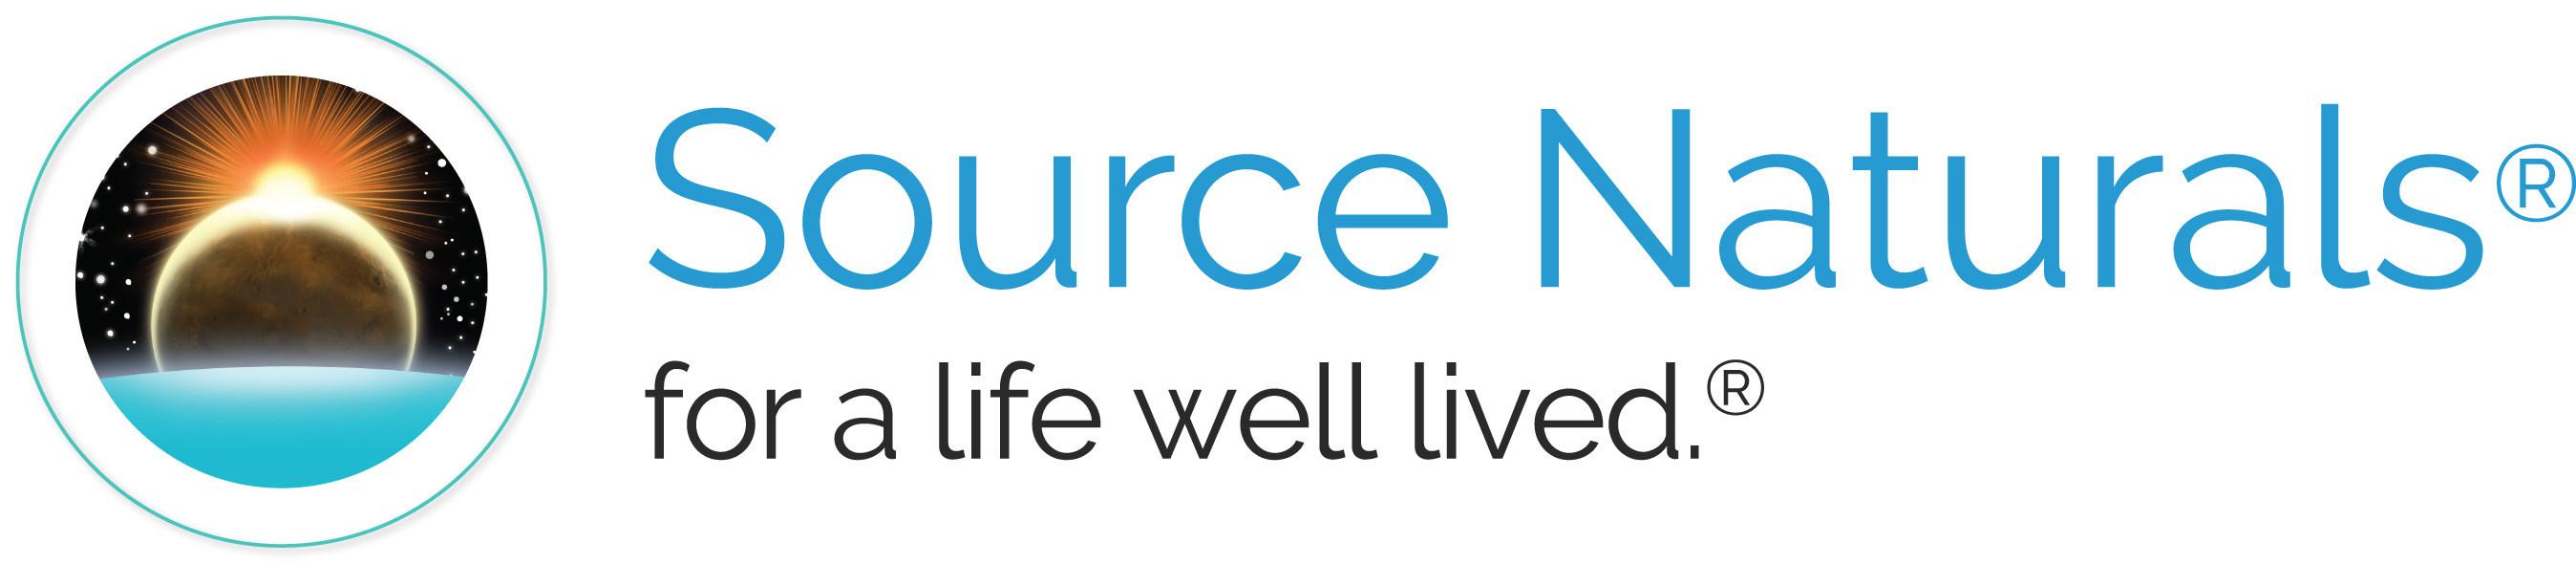 Source Naturals (PRNewsfoto/Source Naturals)